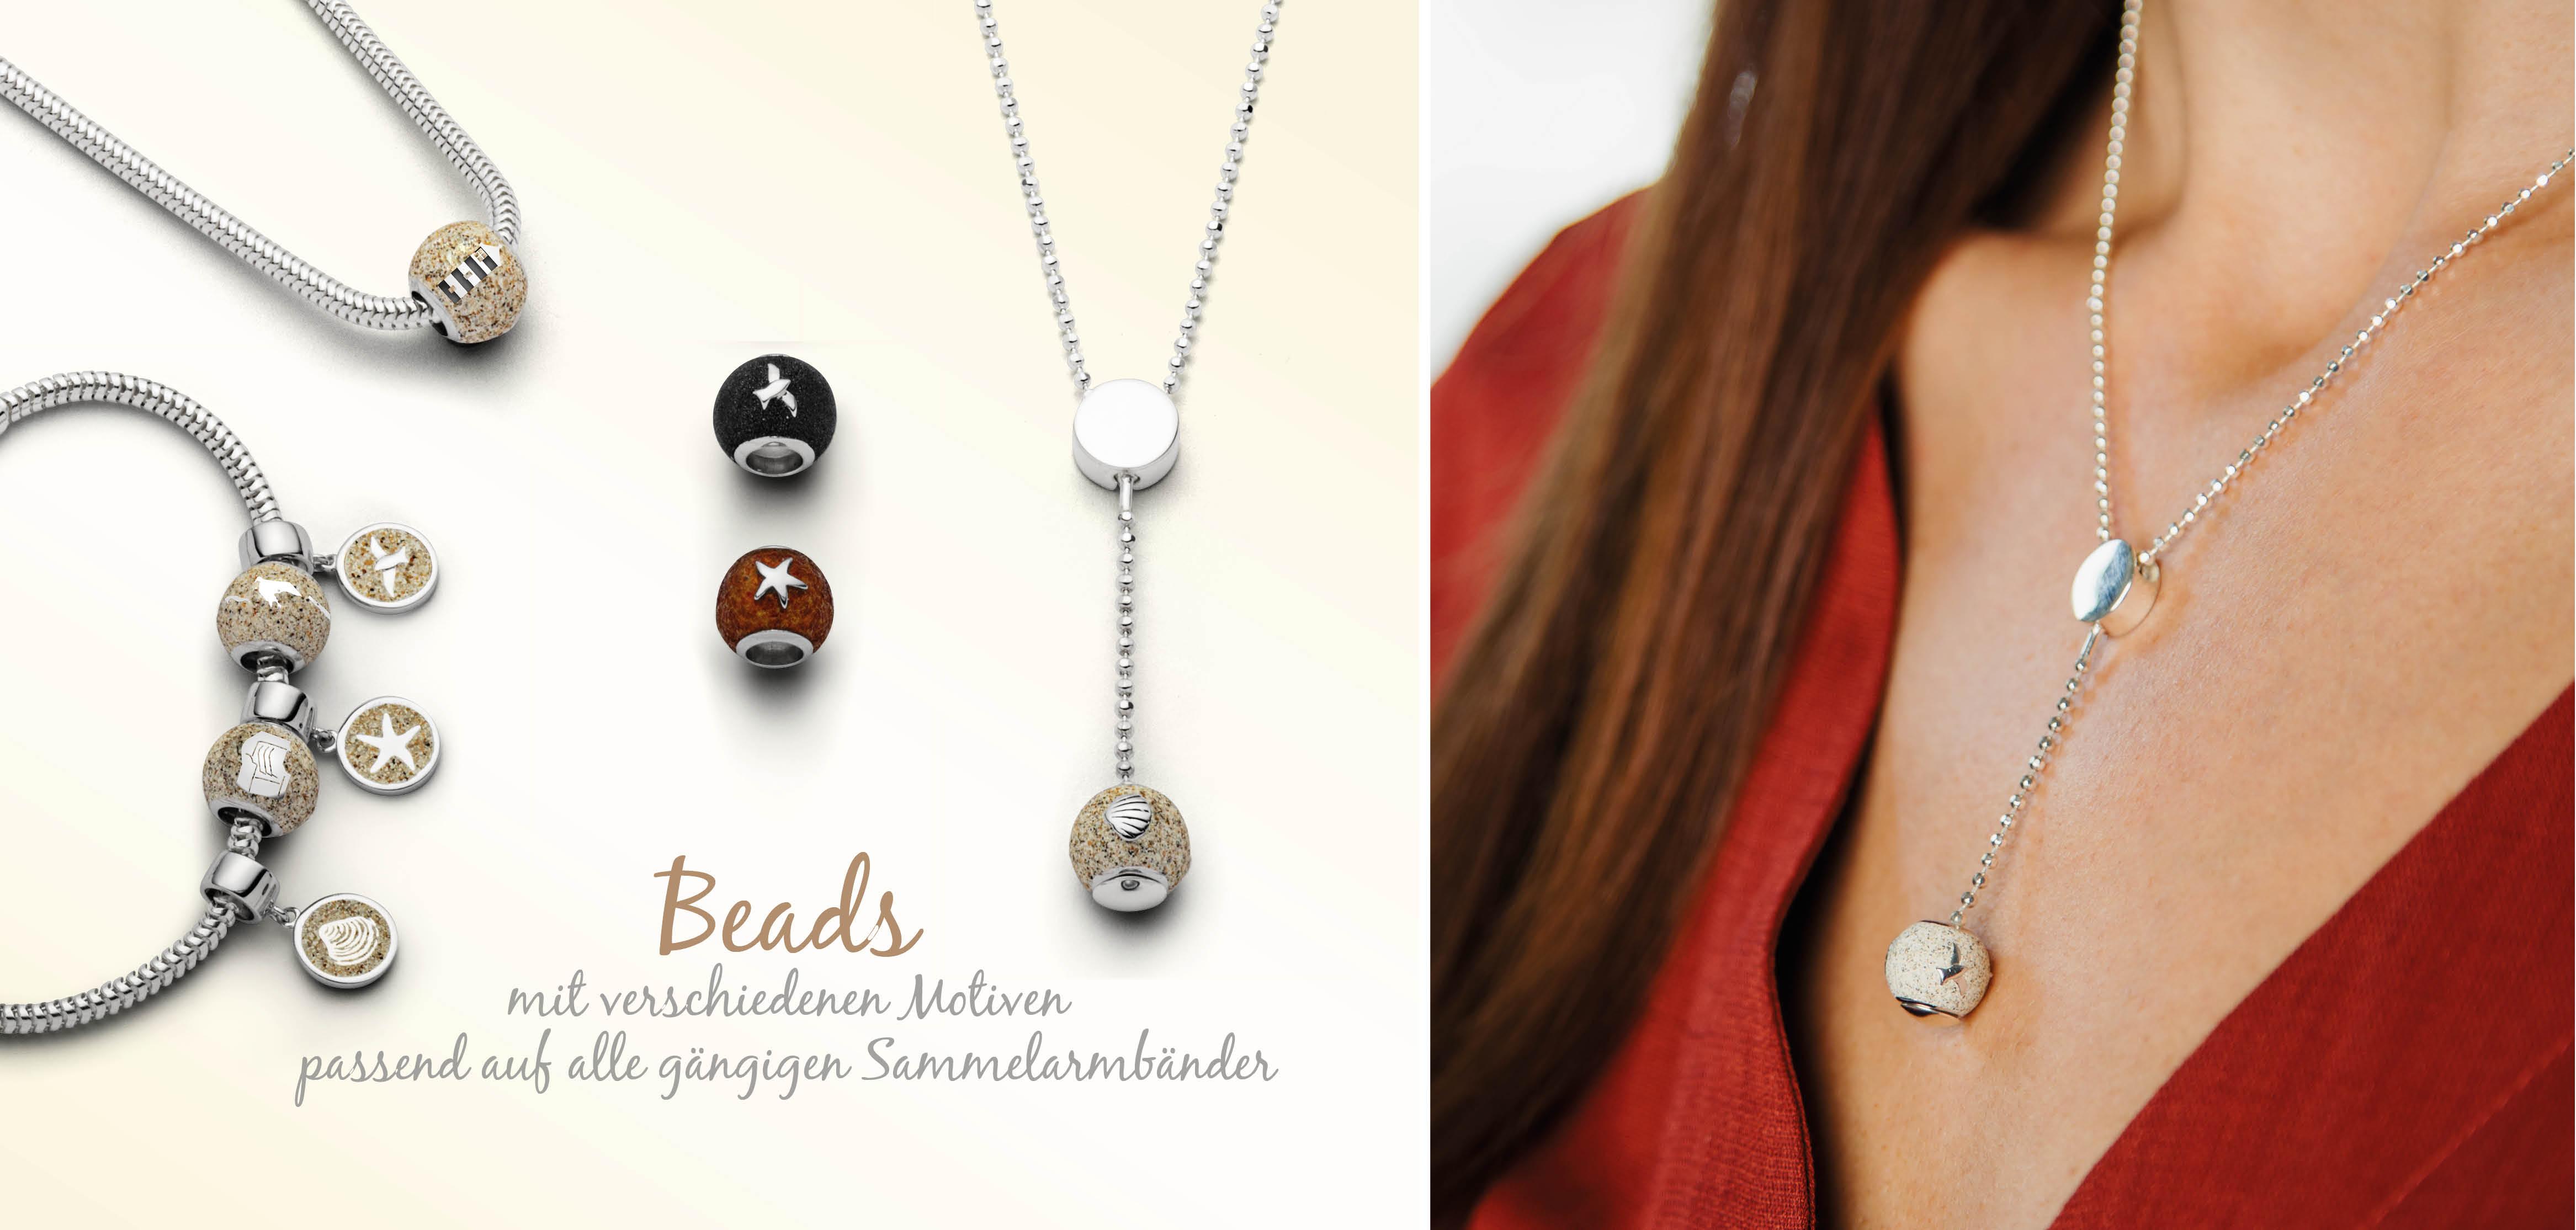 Slider: Beads